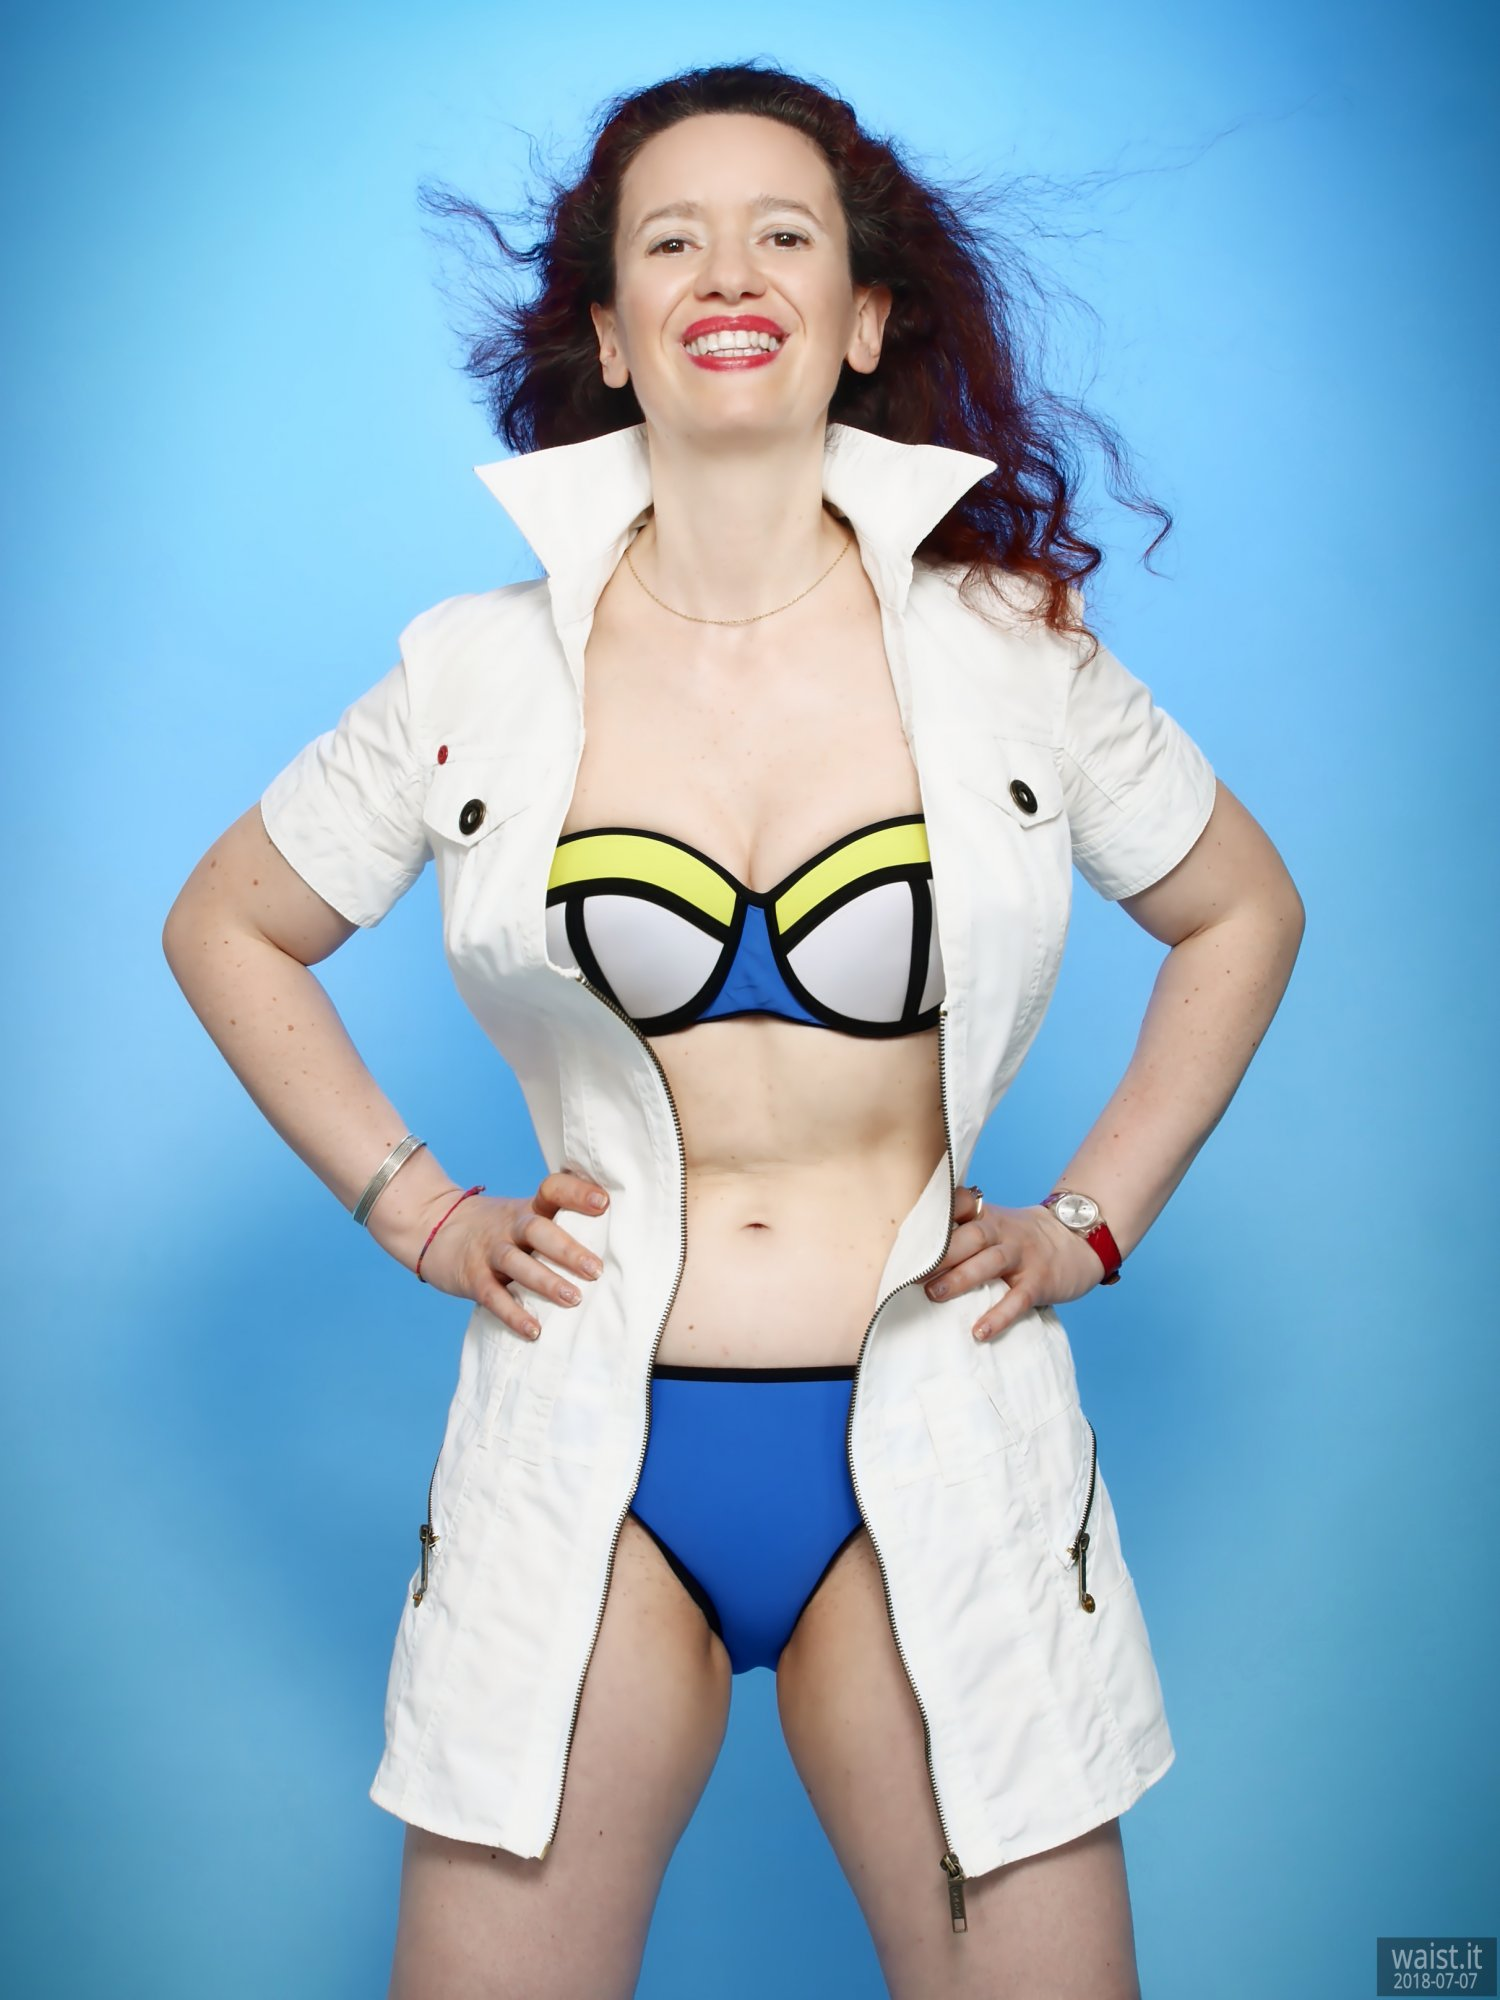 2018-07-07 Chiara in her own white canvas minidress, worn over blue-multi-coloured neoprene bikini